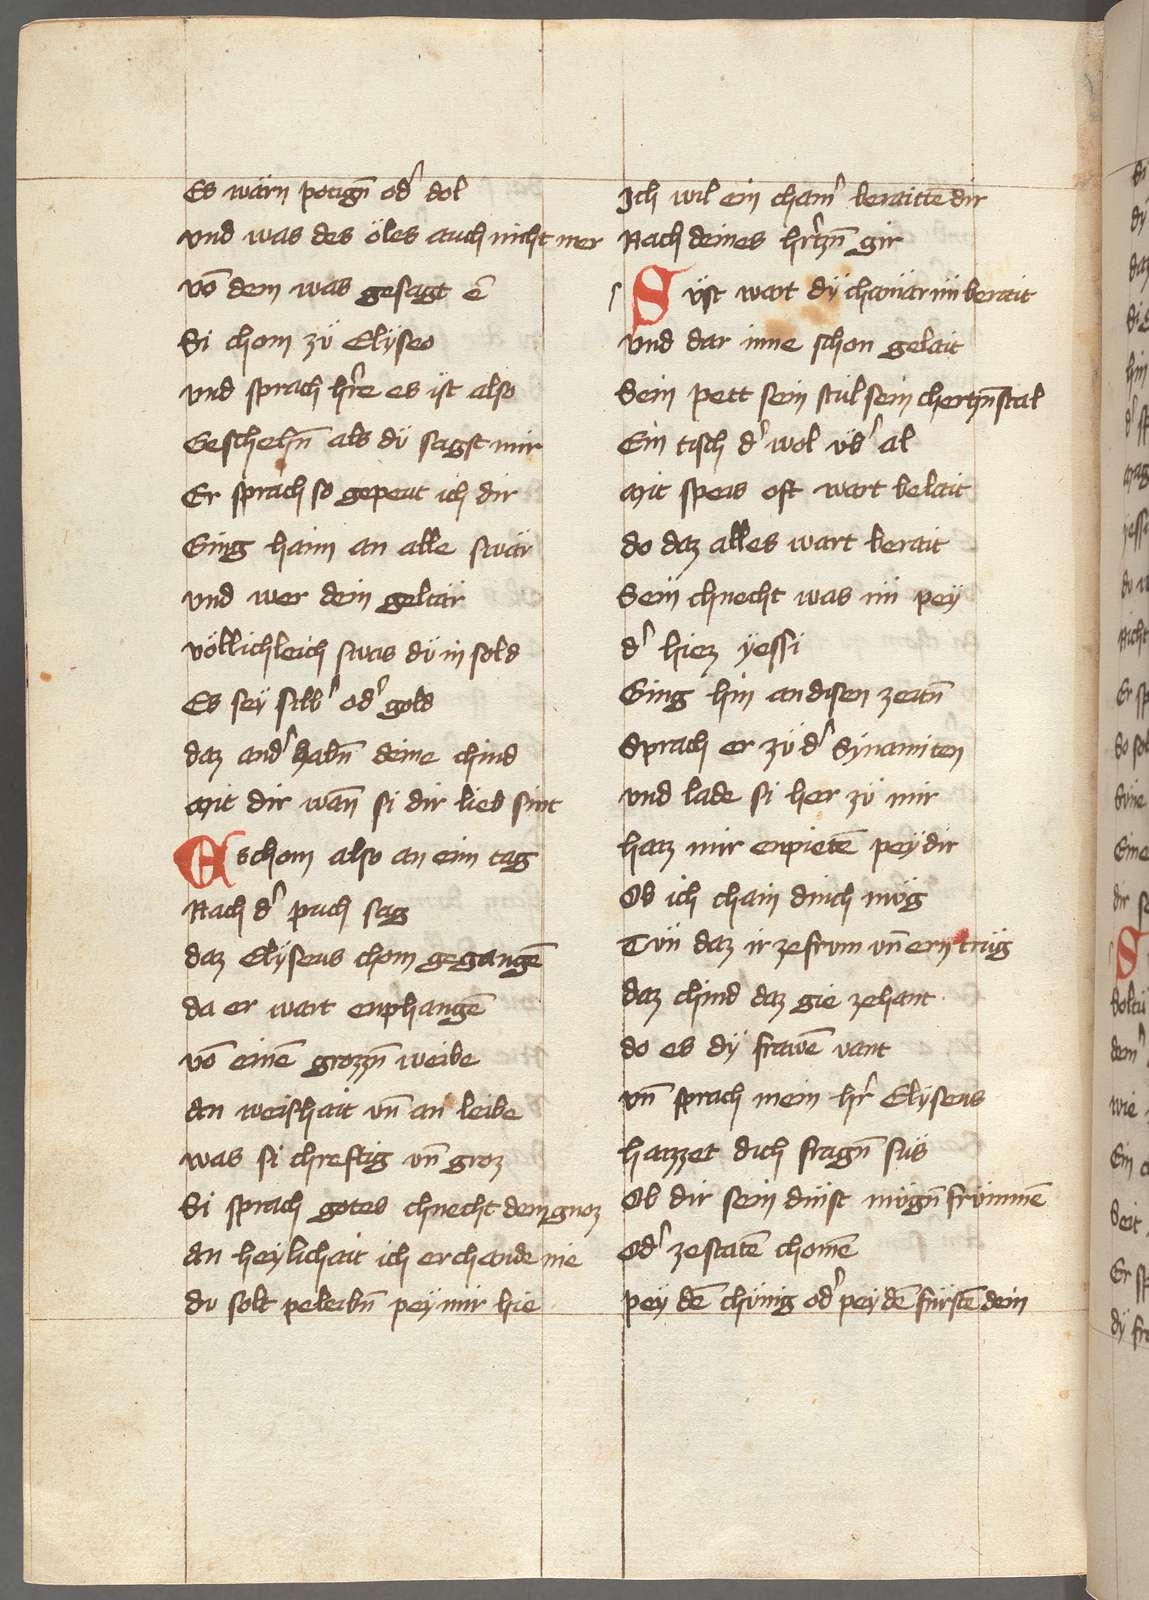 Chronicle of the World by the Austrian epic poet Rudolf von Elms. German illuminated manuscript.